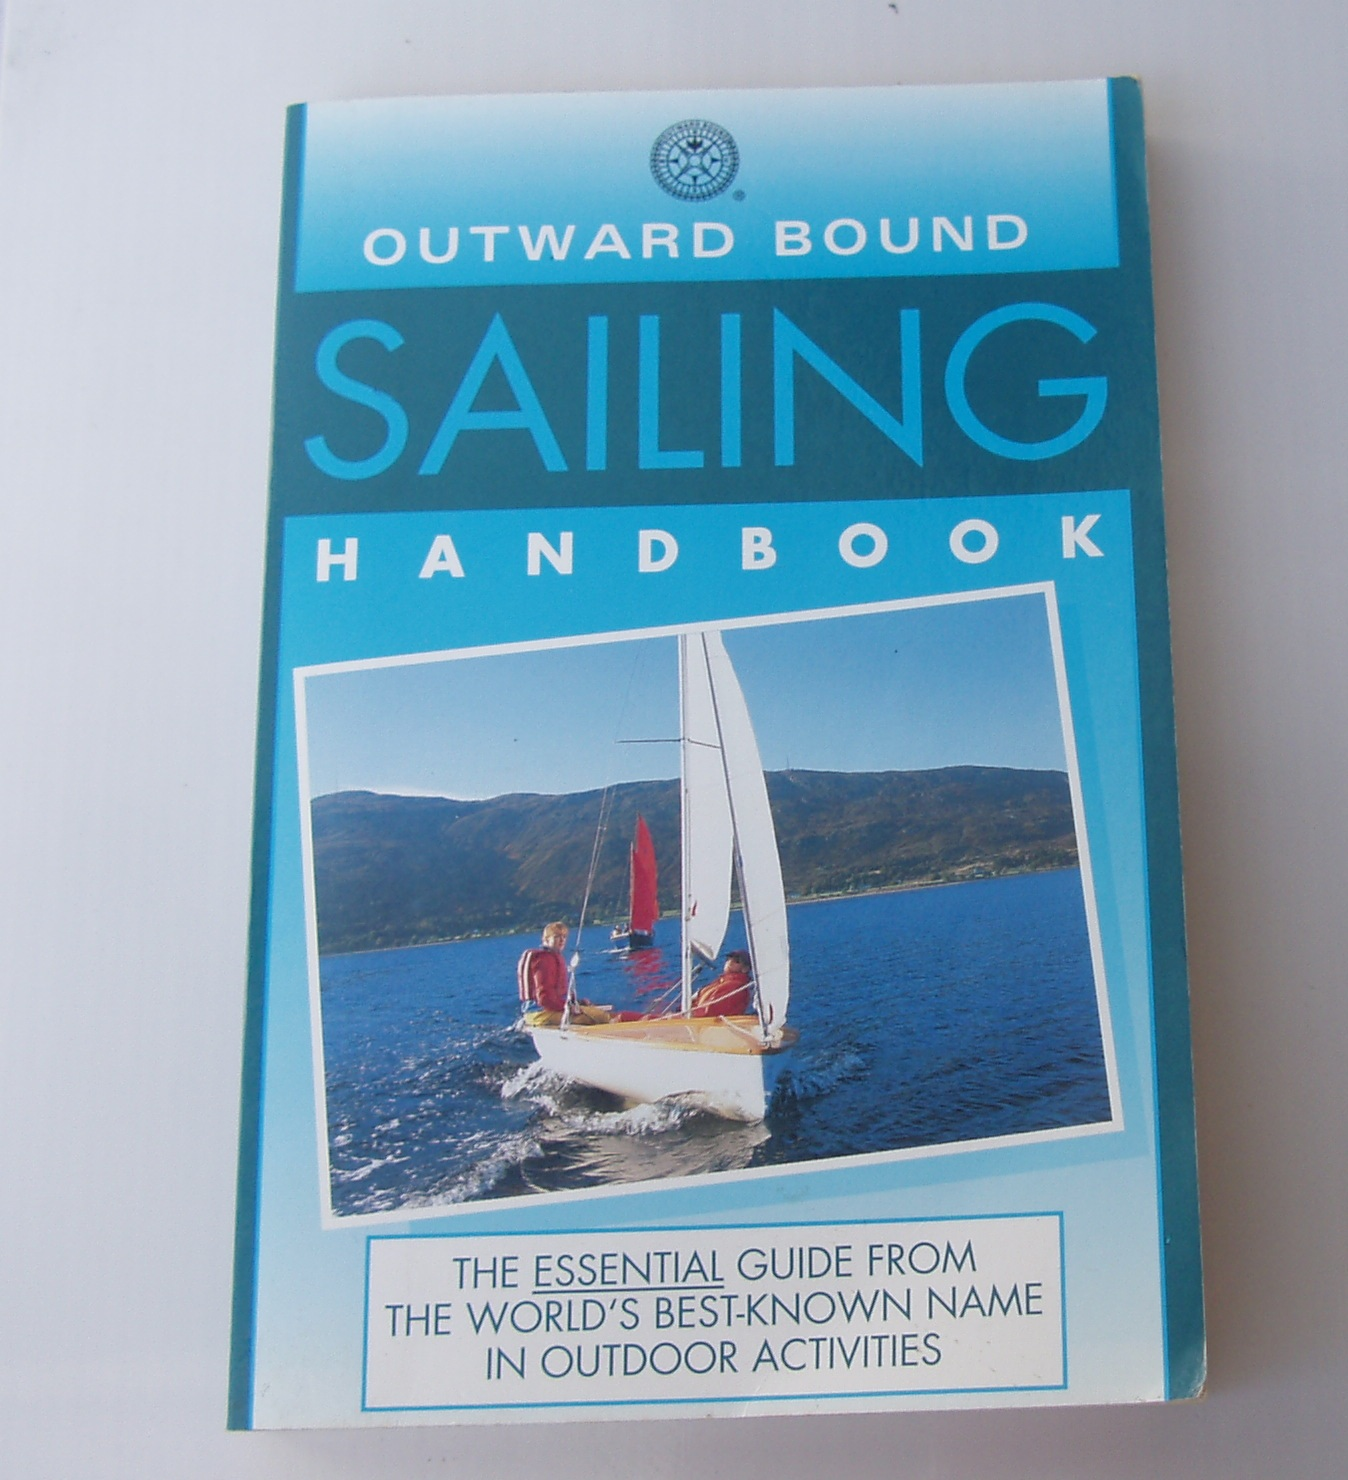 Outward Bound Sailing Handbook by Martin Balcombe - Paperback